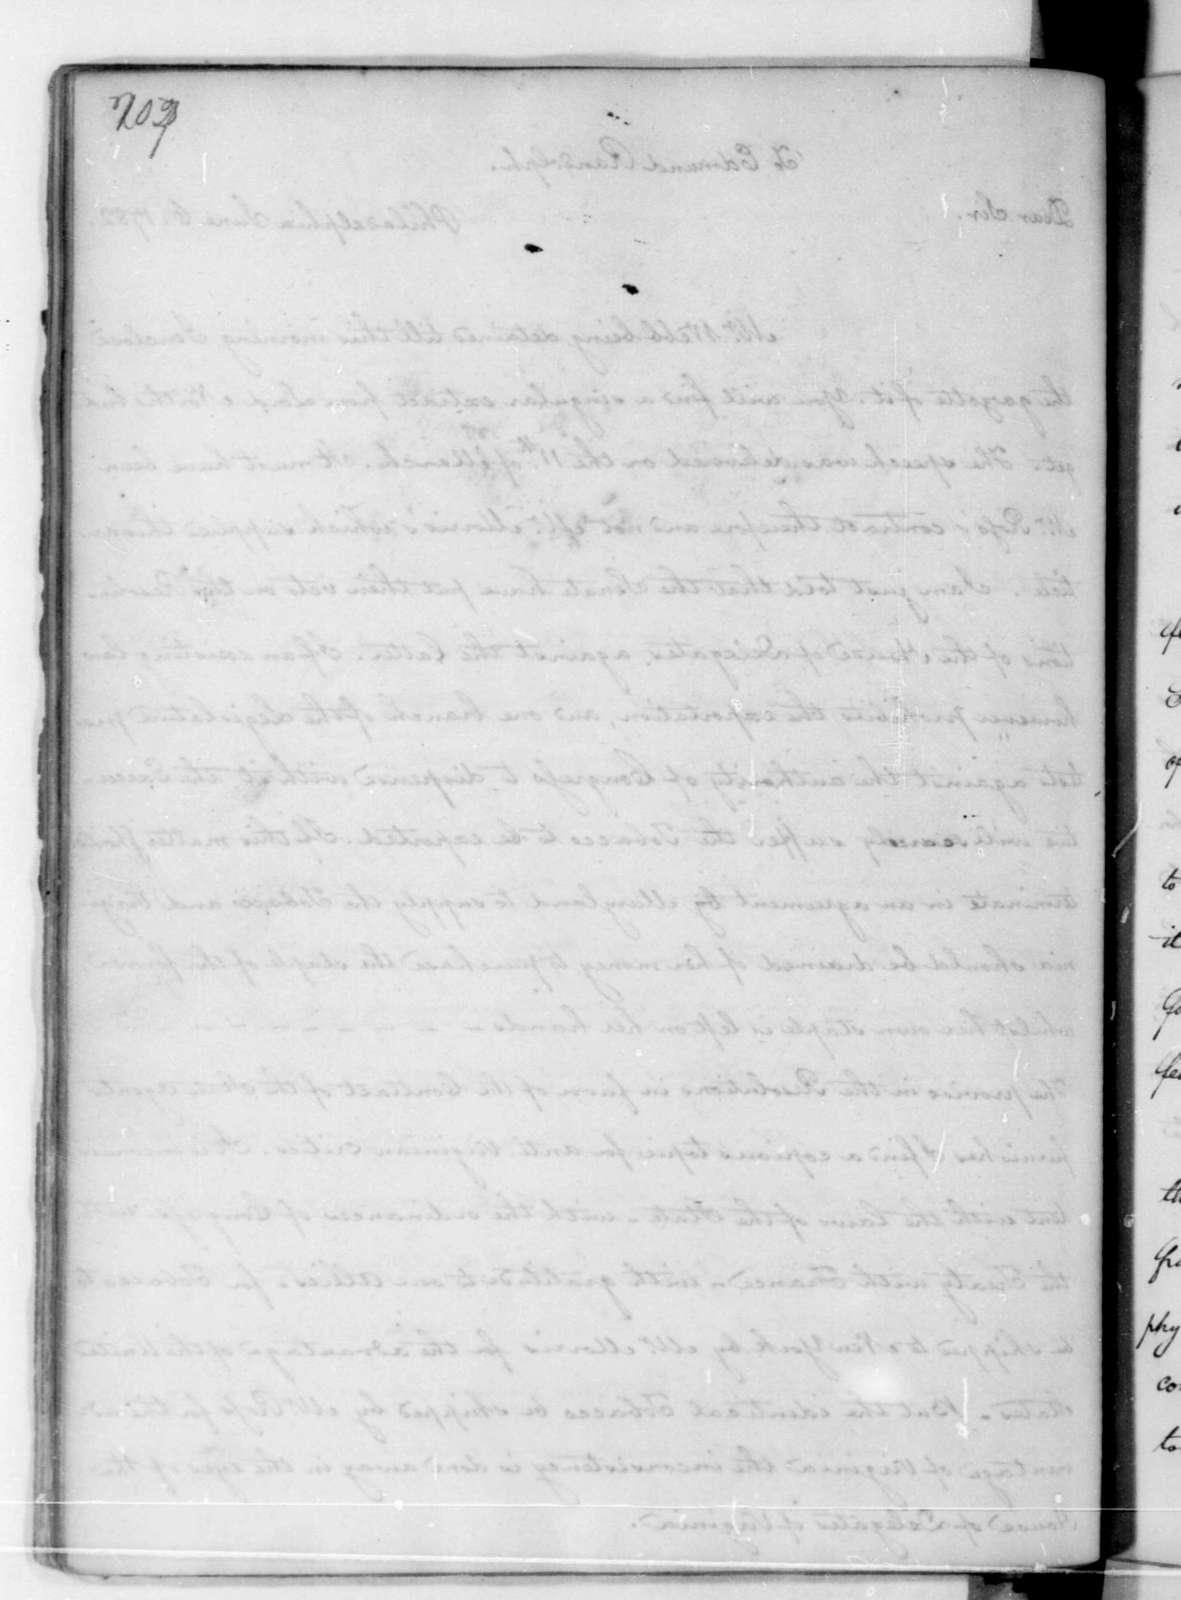 James Madison to Edmund Randolph, June 6, 1782.